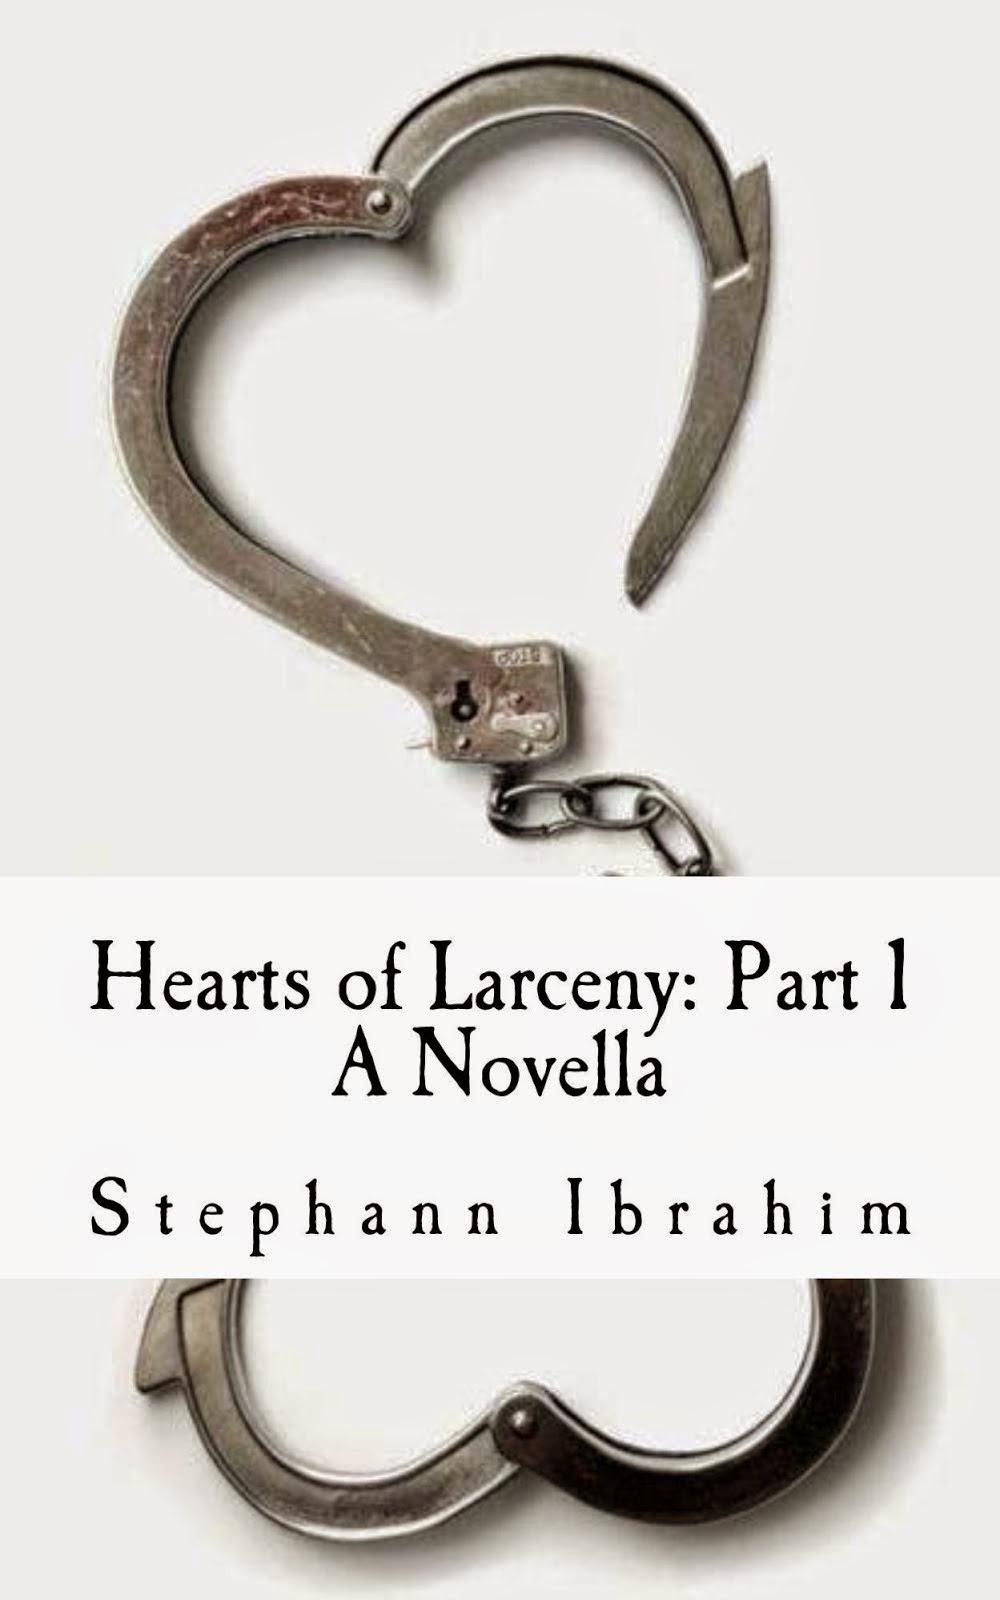 Hearts of Larceny: A Novella: A Novella